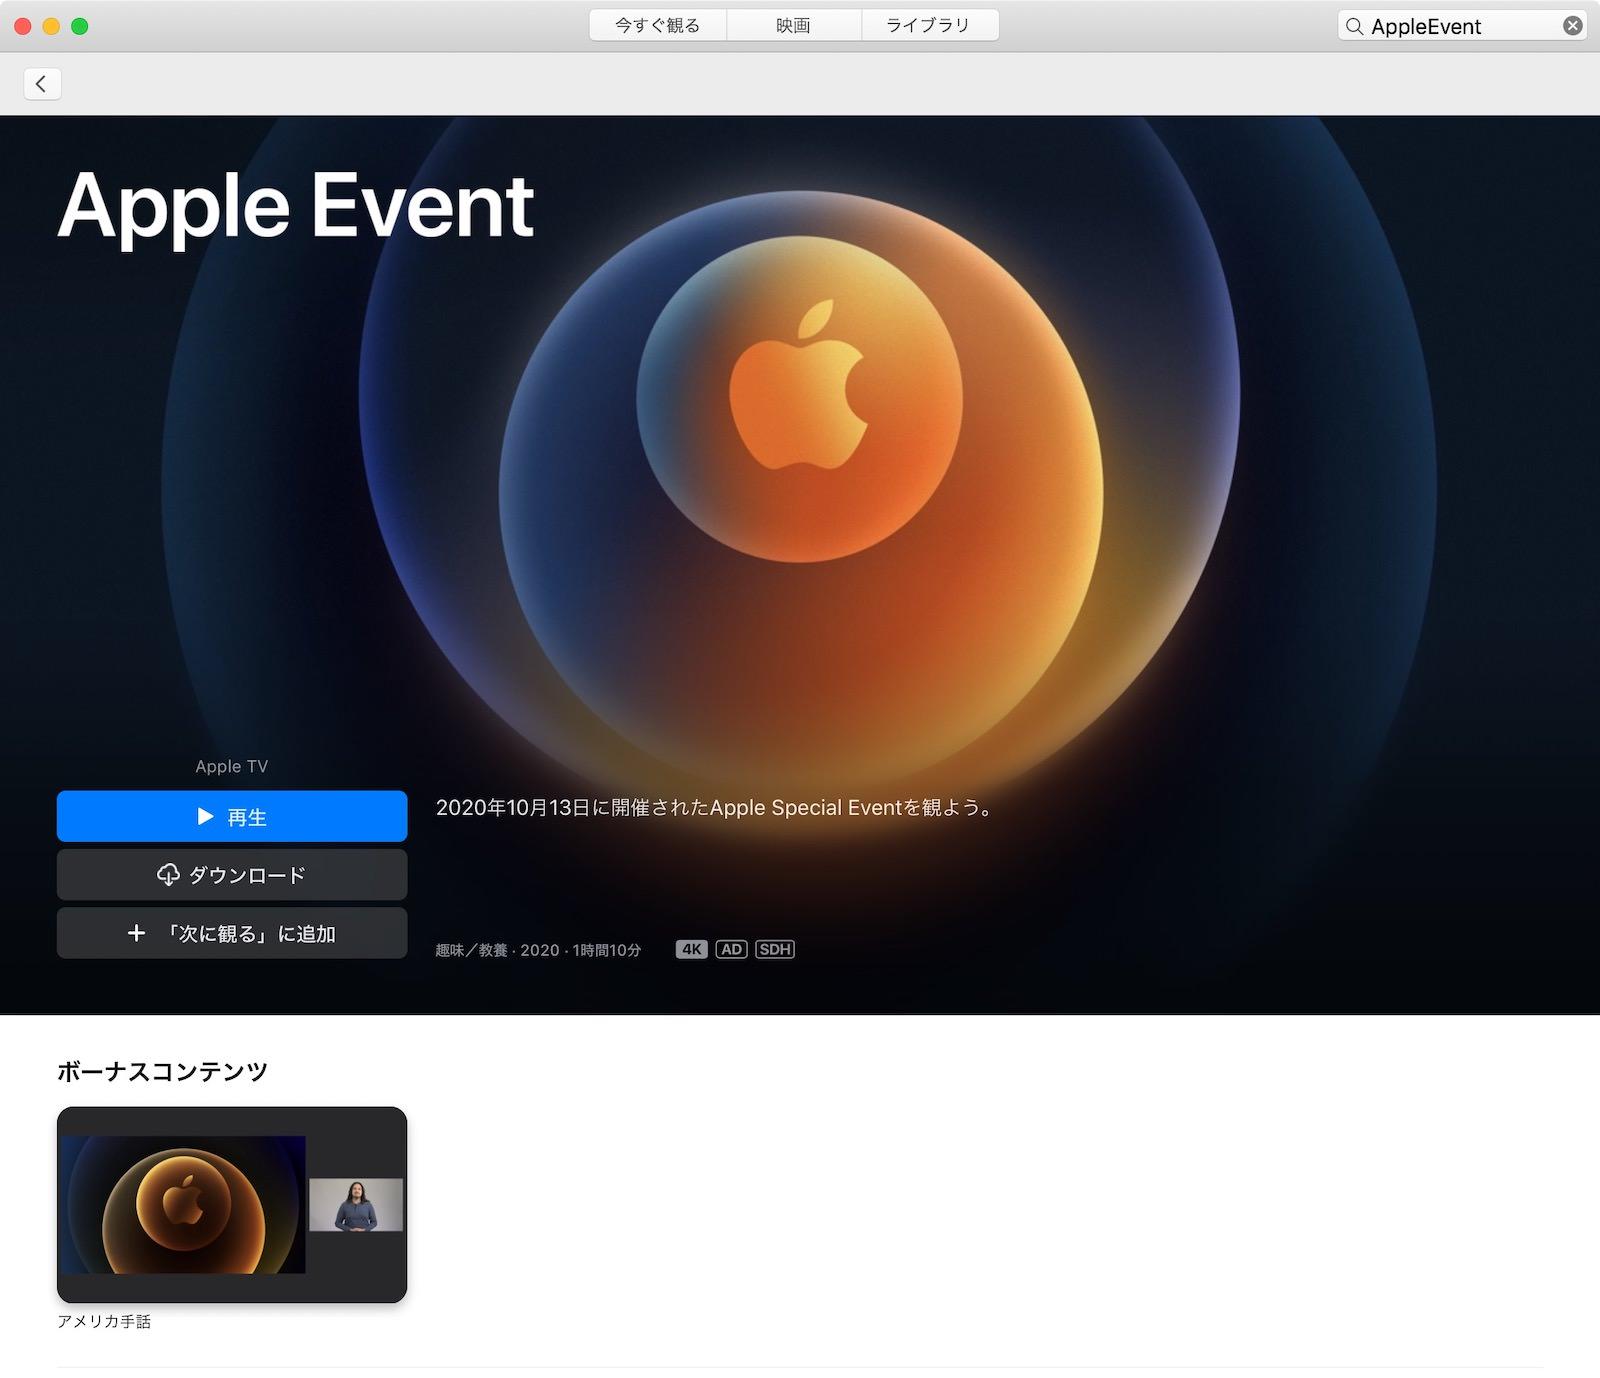 Appleevent on tv app